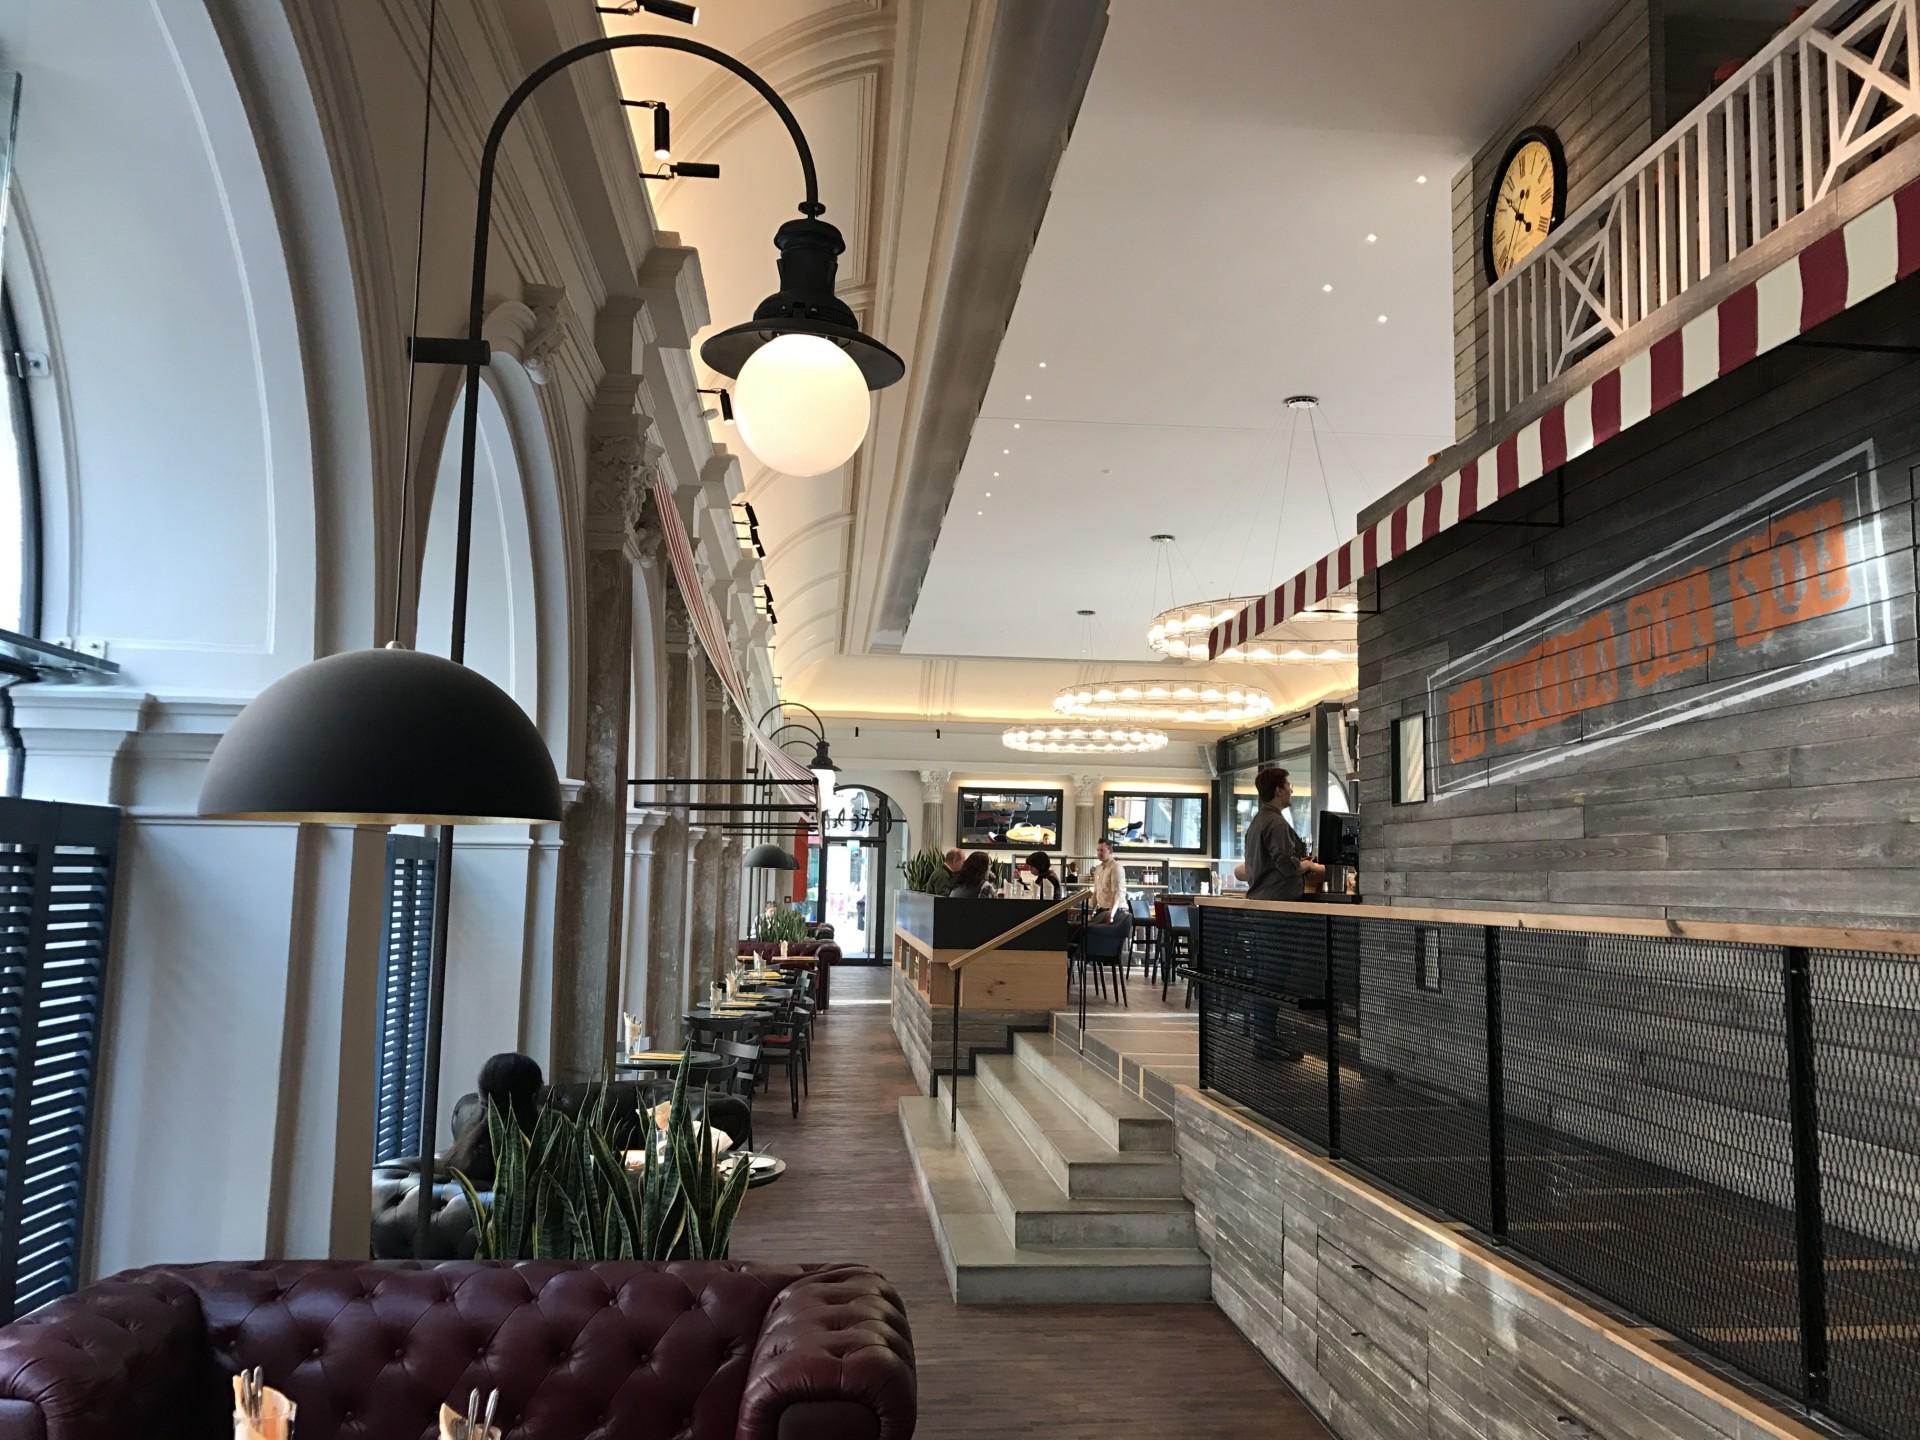 Cafe Wiesbaden